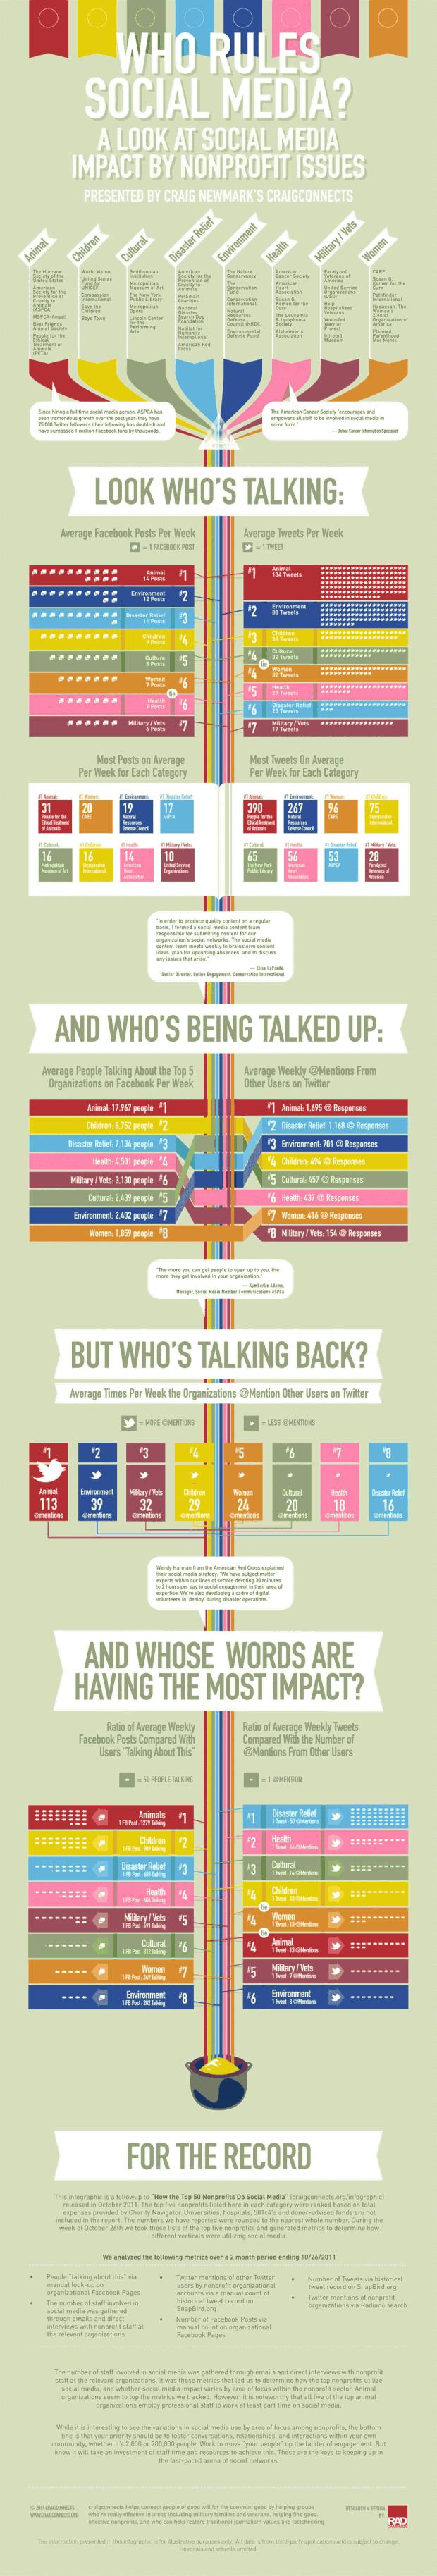 Who Rules Social Media